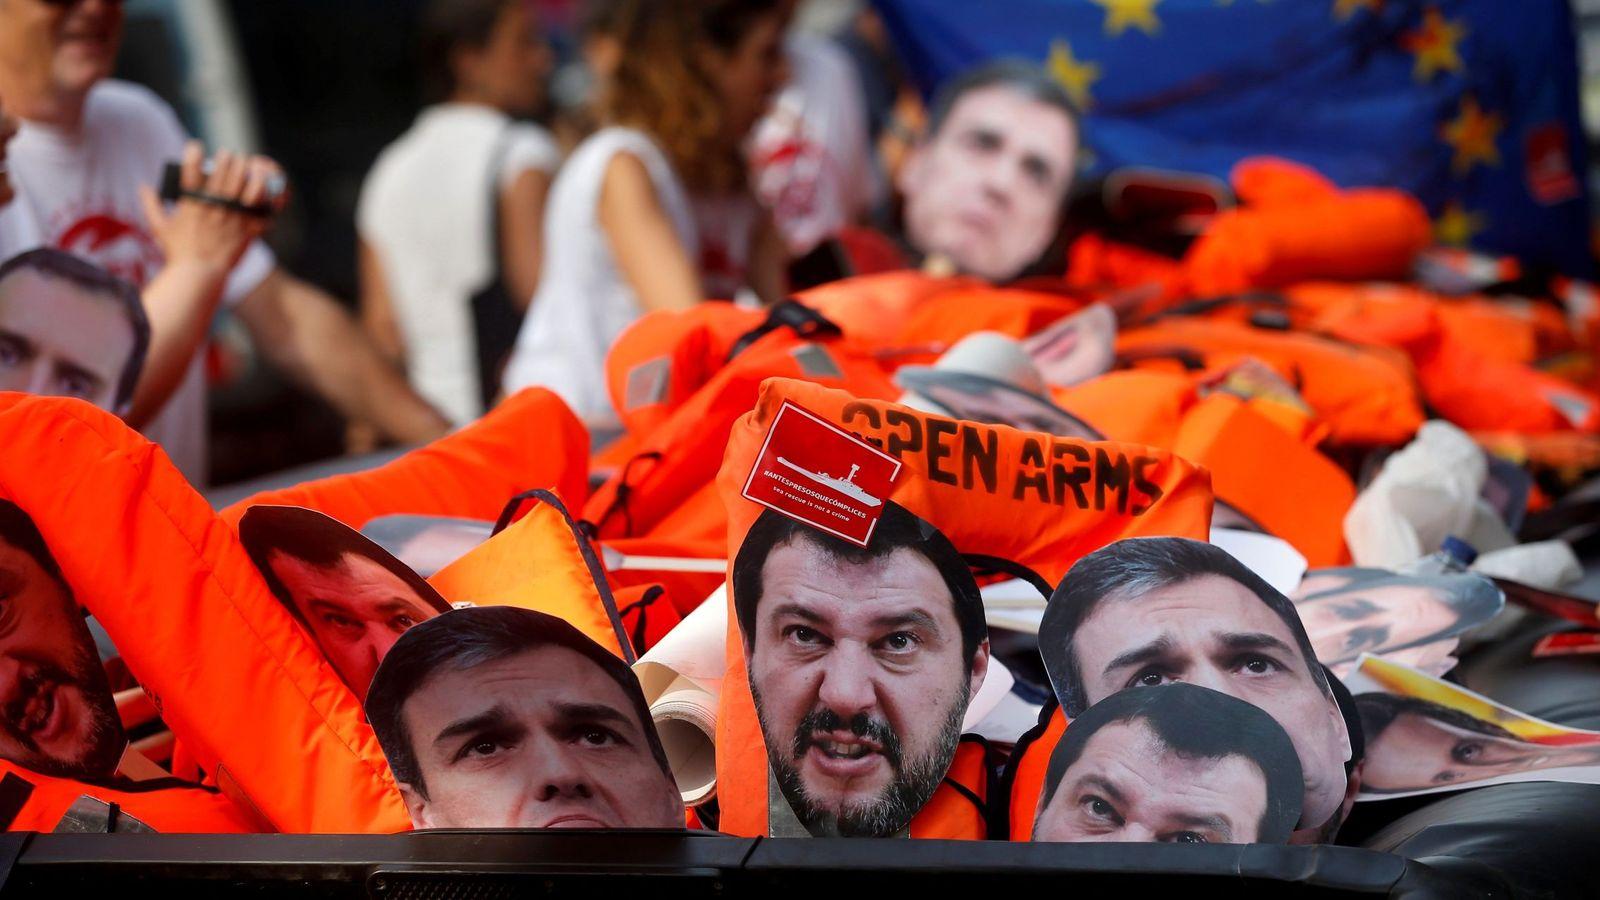 Foto: Manifestación convocada por Open Arms. (EFE)